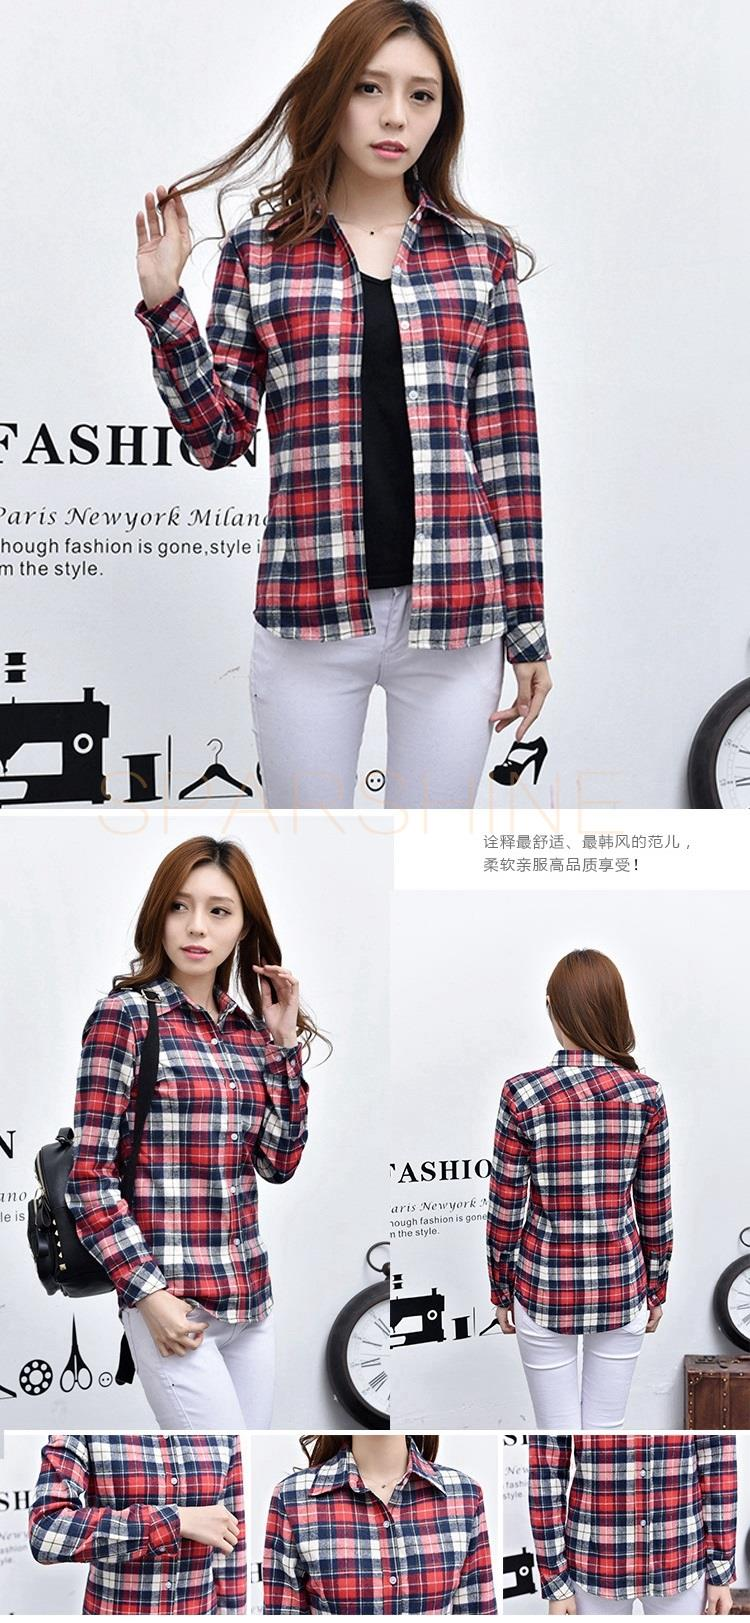 HTB1h6TbLFXXXXa9XVXXq6xXFXXXc - Girl's Plaid Flannel Shirt PTC 67